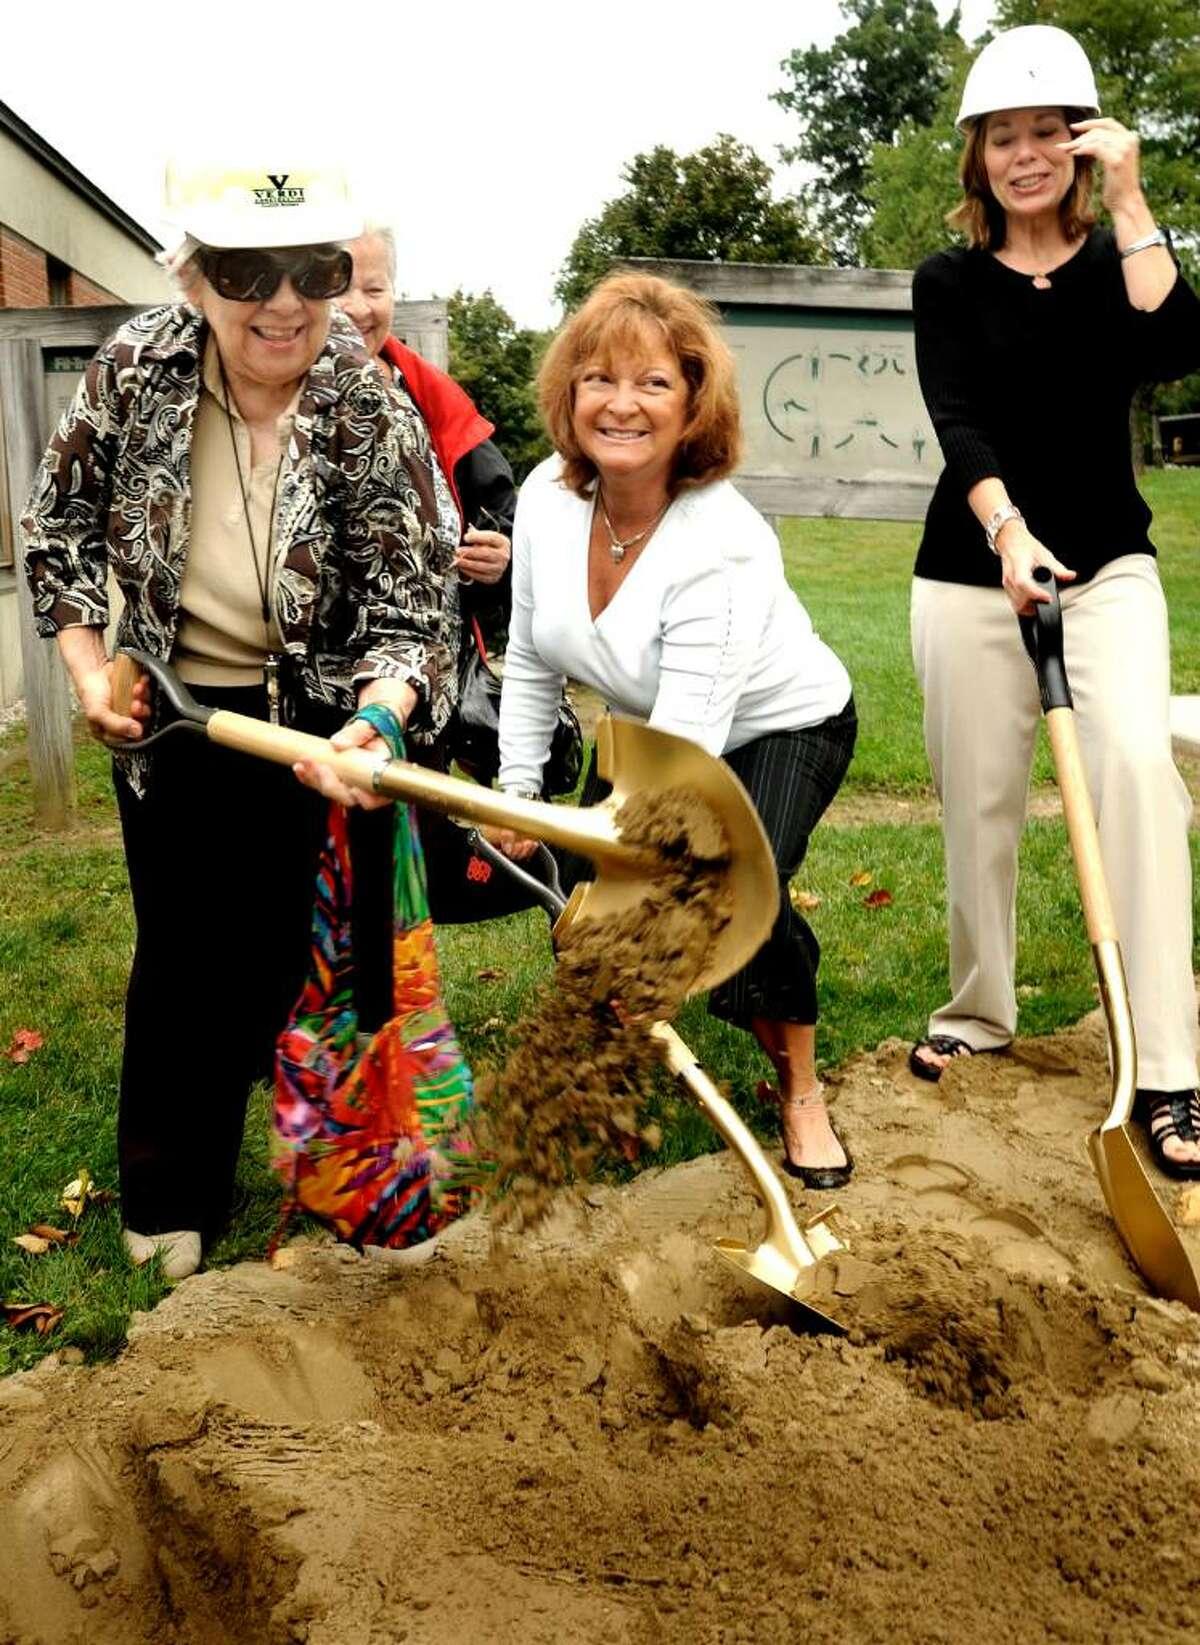 Millie Foster, 74, left, Arlene Farrell, center, and Gail Pellis shovel dirt during groundbreaking ceremonies for the Brookfield Senior Renovation and Expansion on Wednesday, Sept. 23,2009.